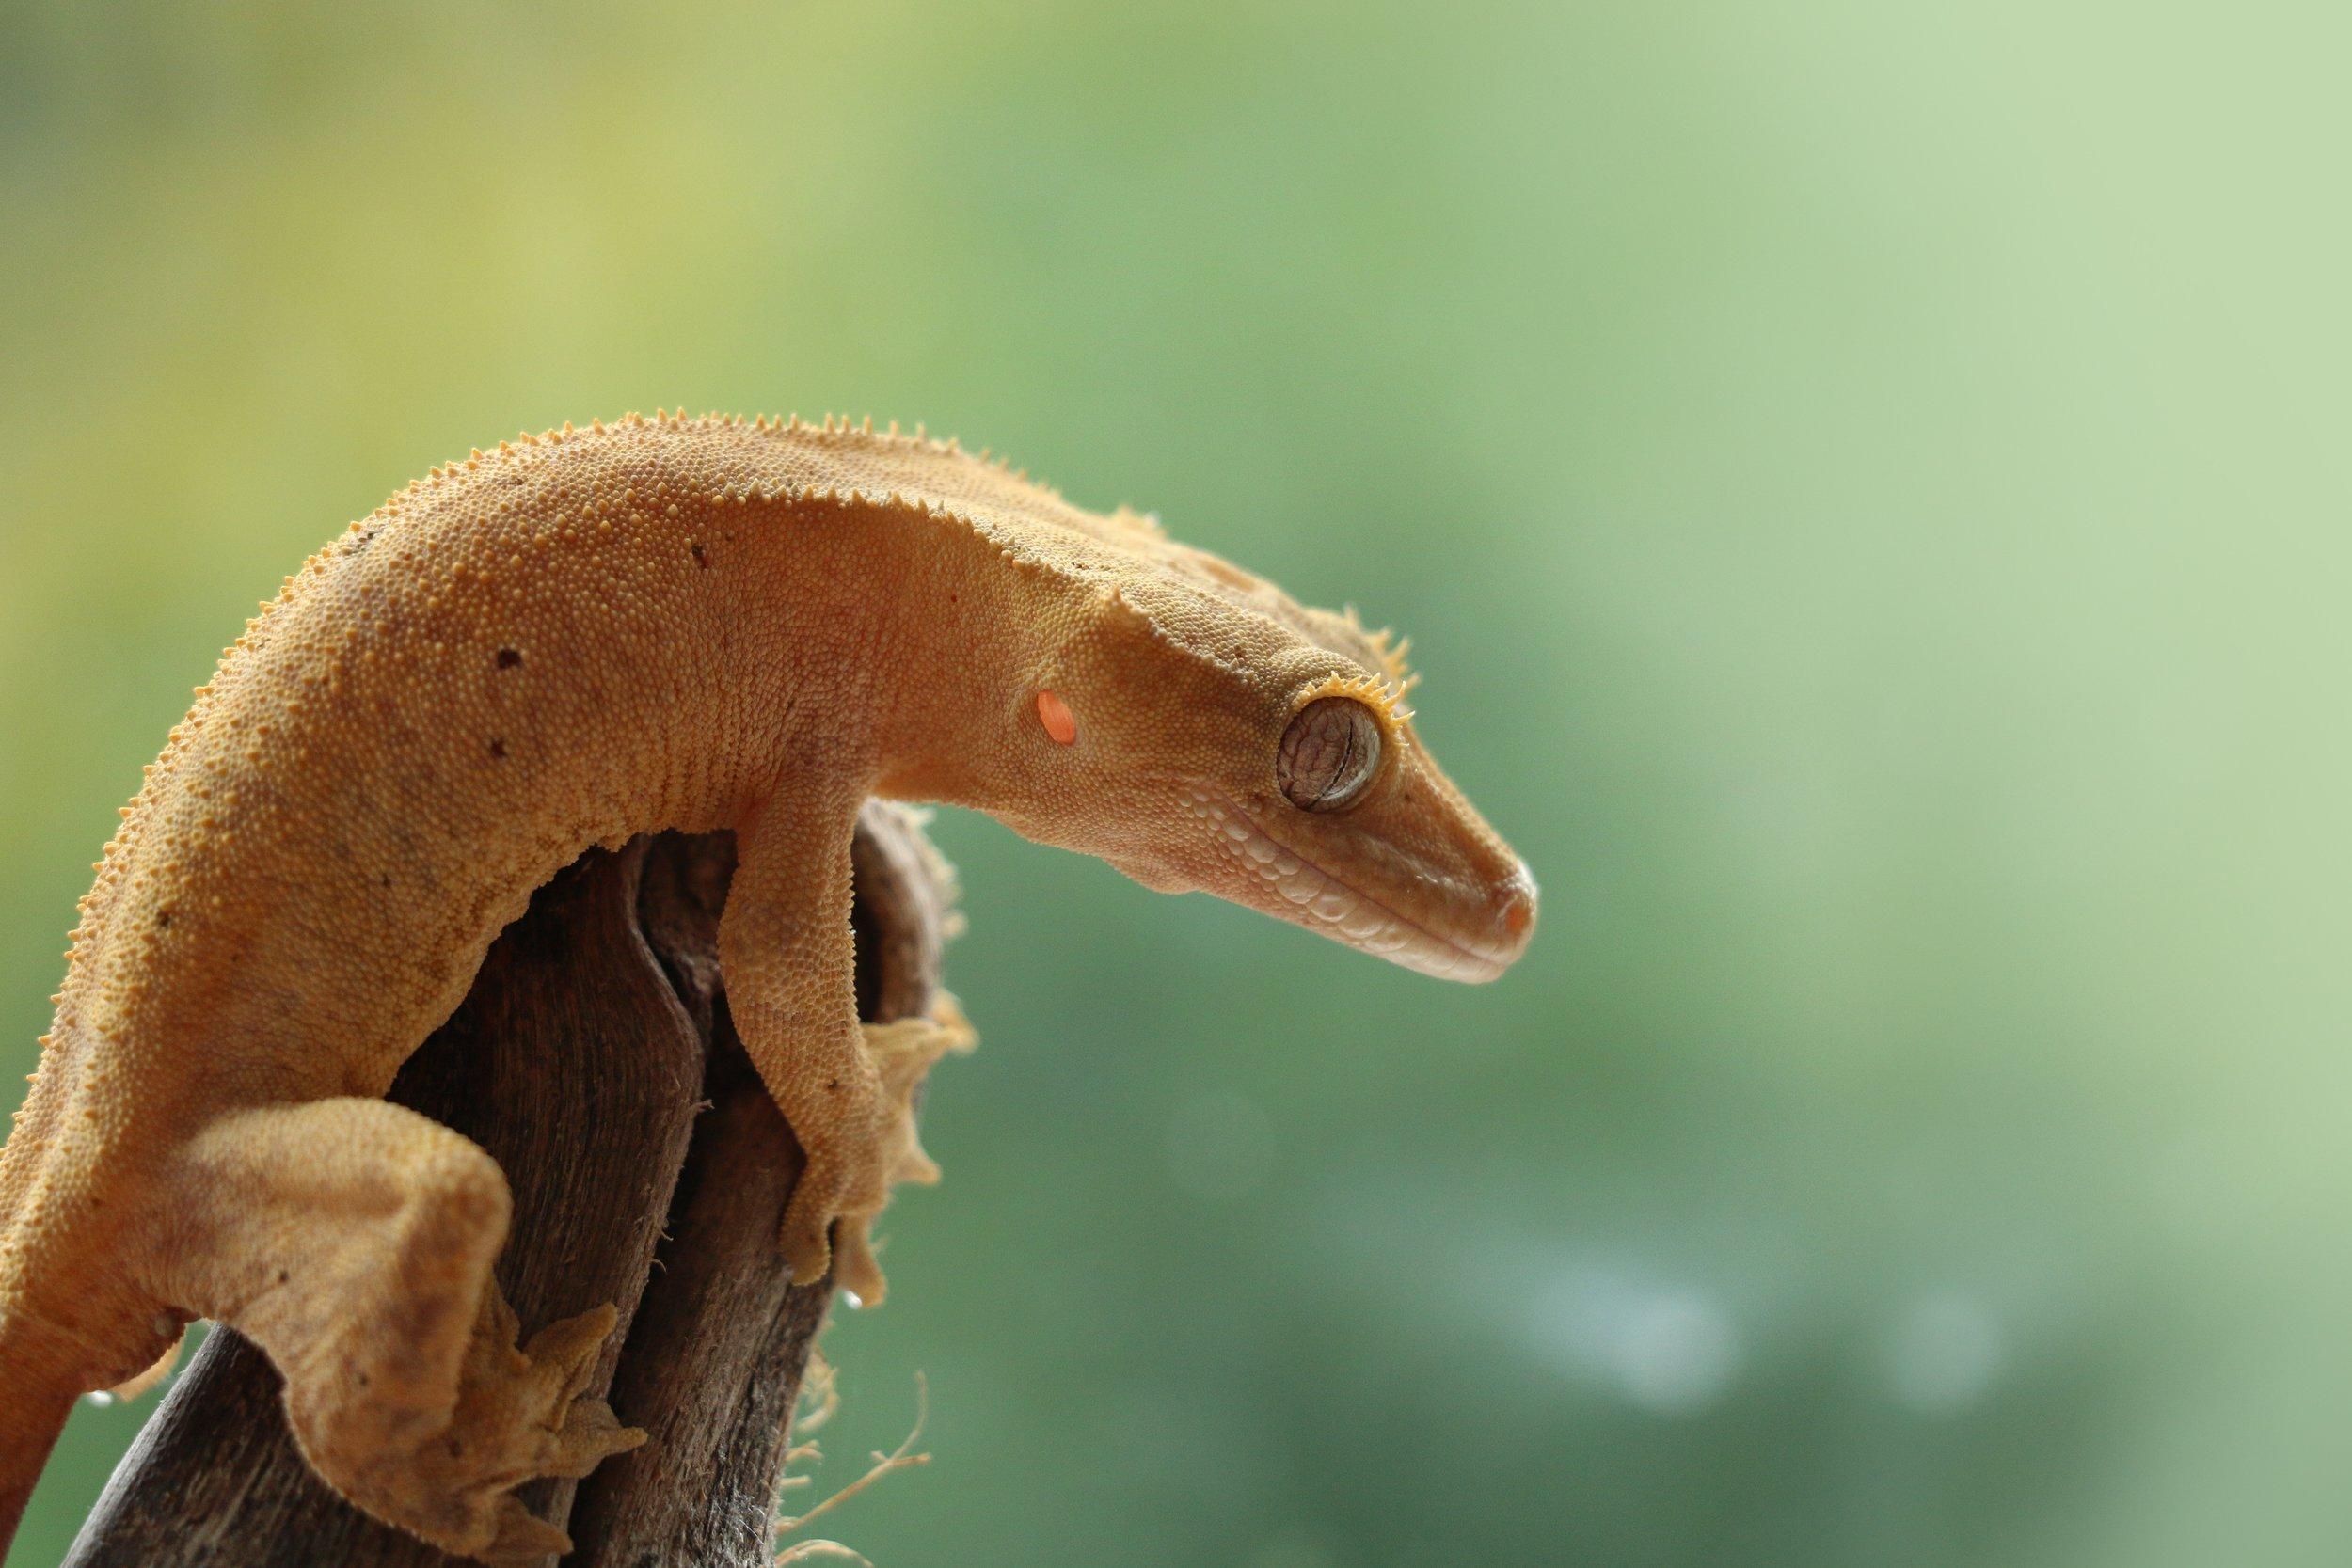 Redding Reptiles